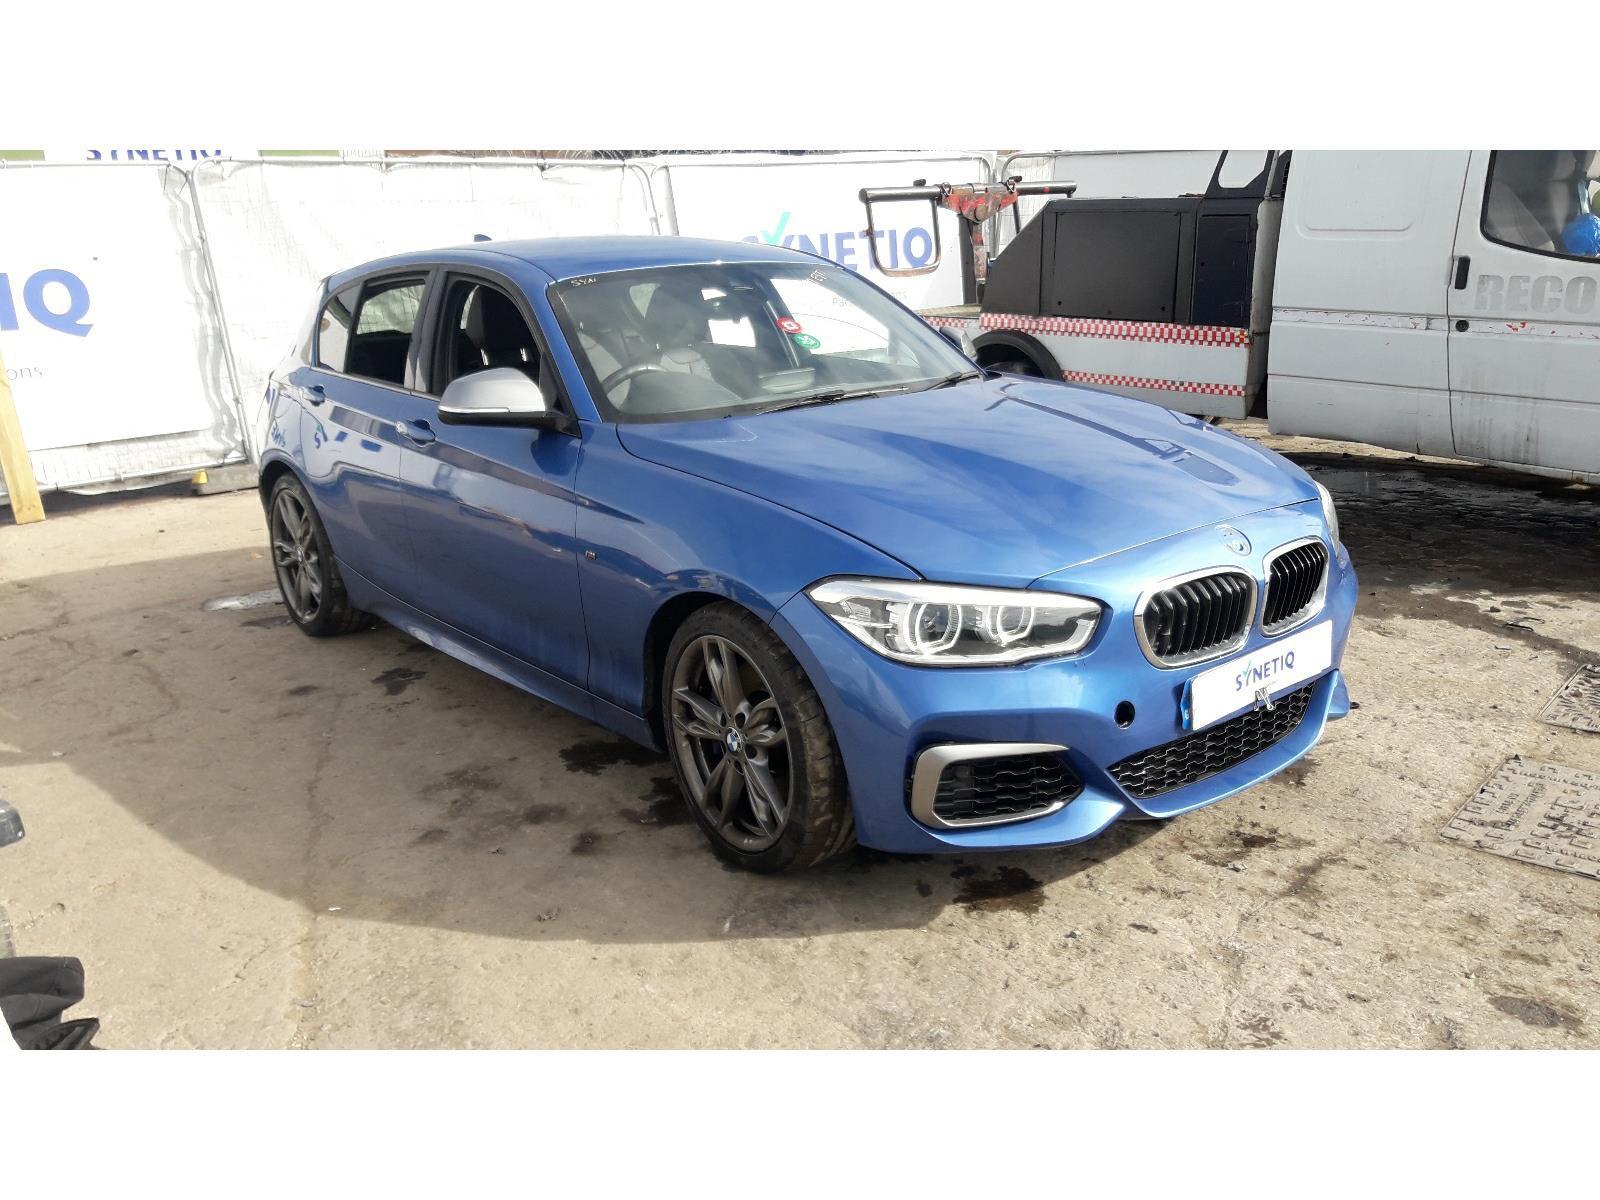 2016 BMW 1 SERIES M140I 2998cc TURBO PETROL AUTOMATIC 5 DOOR HATCHBACK